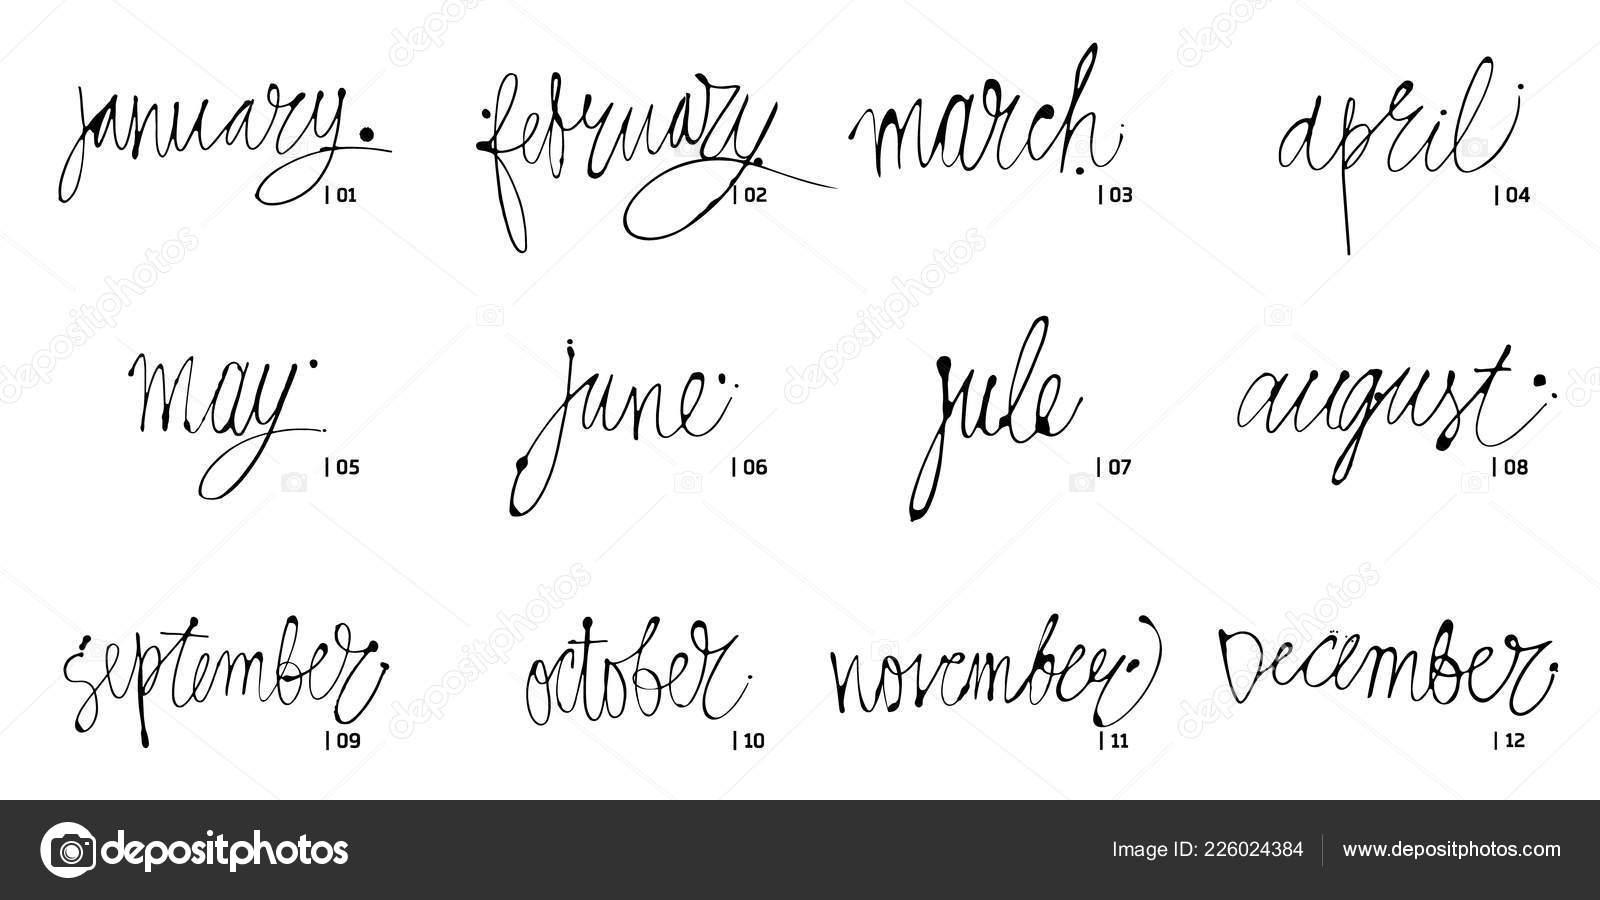 Handwritten names of months December, January, February